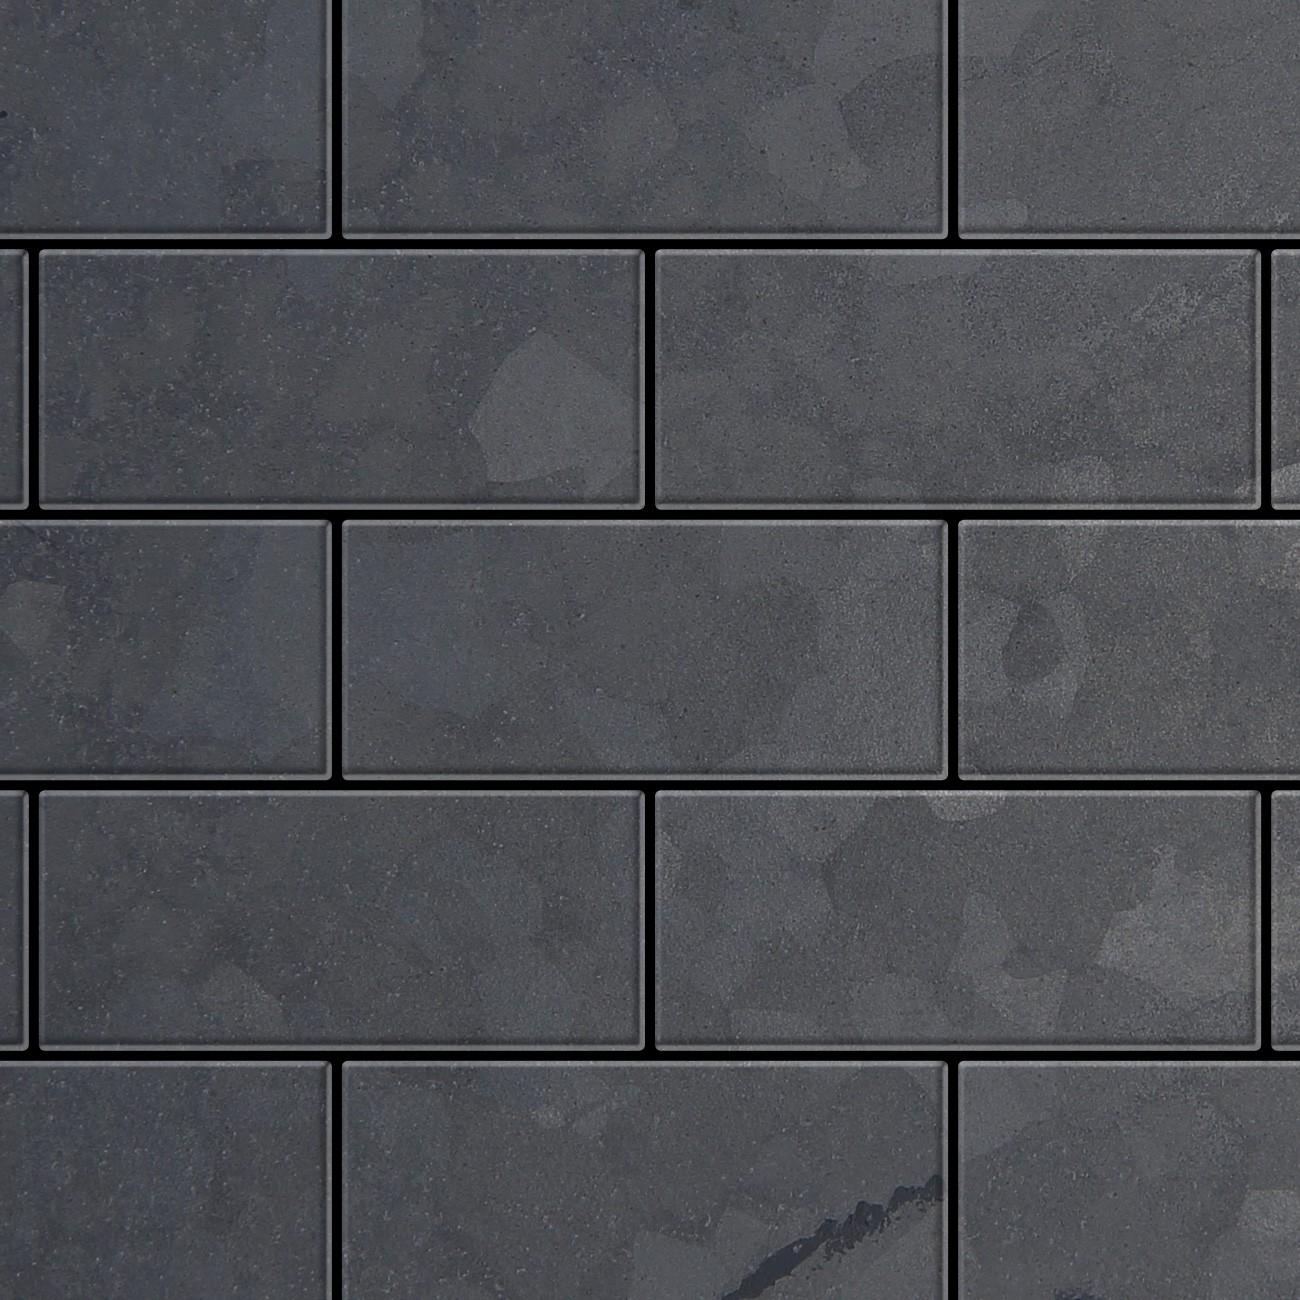 metallmosaik fliesen aus massivem rohstahl gewalzt in grau. Black Bedroom Furniture Sets. Home Design Ideas